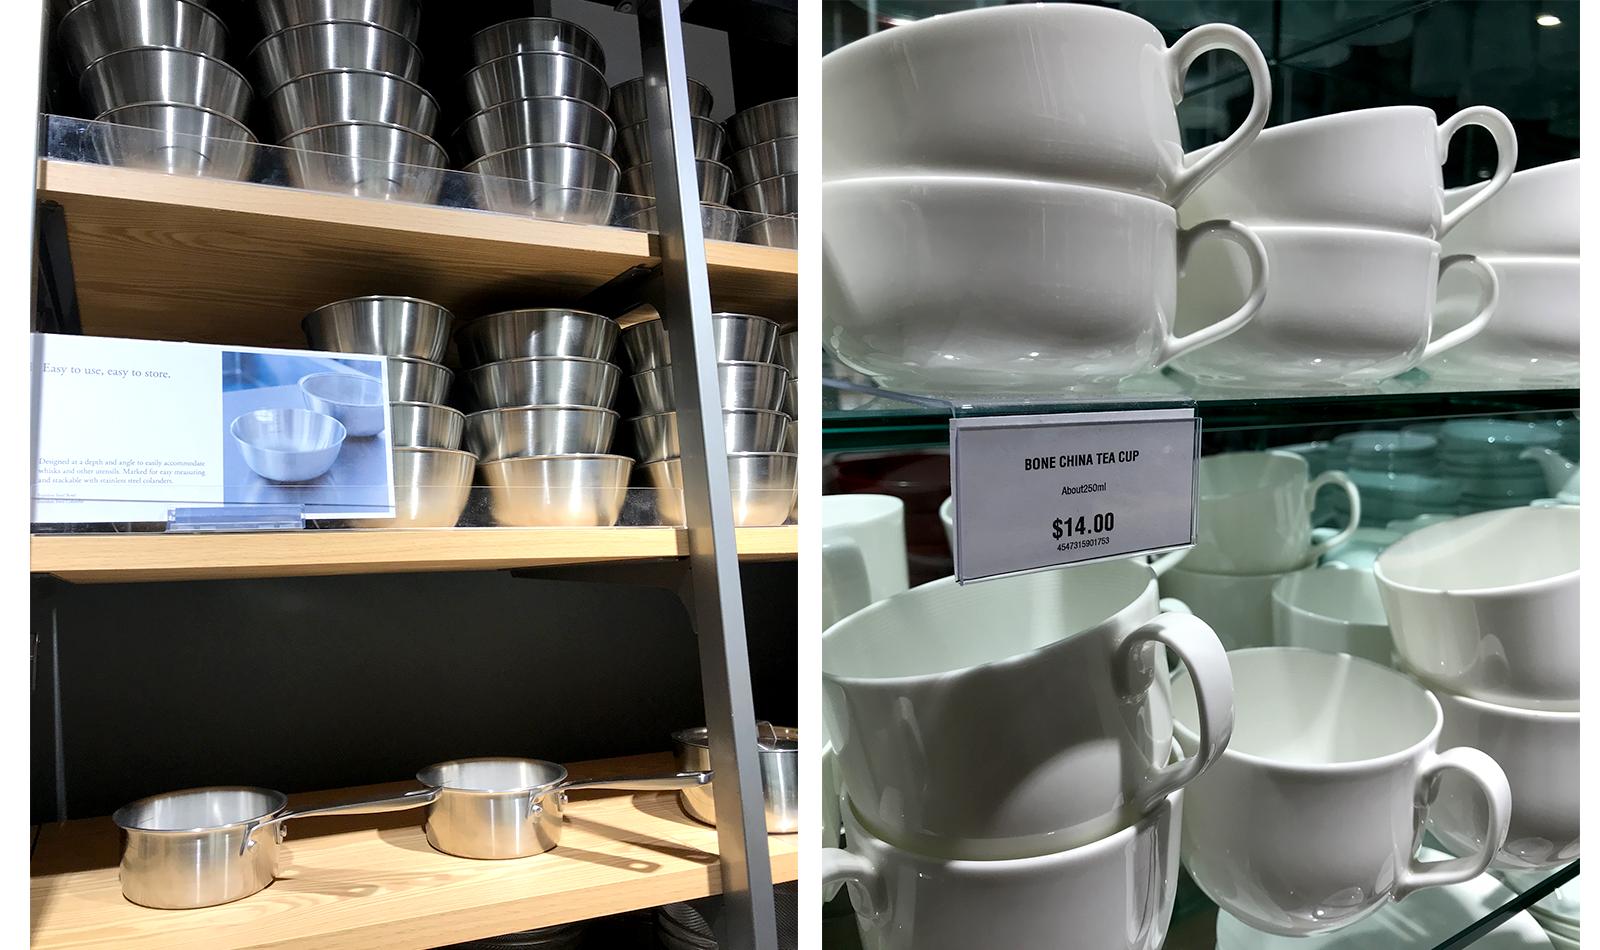 muji-kitchen-pots-pans-tea-cups